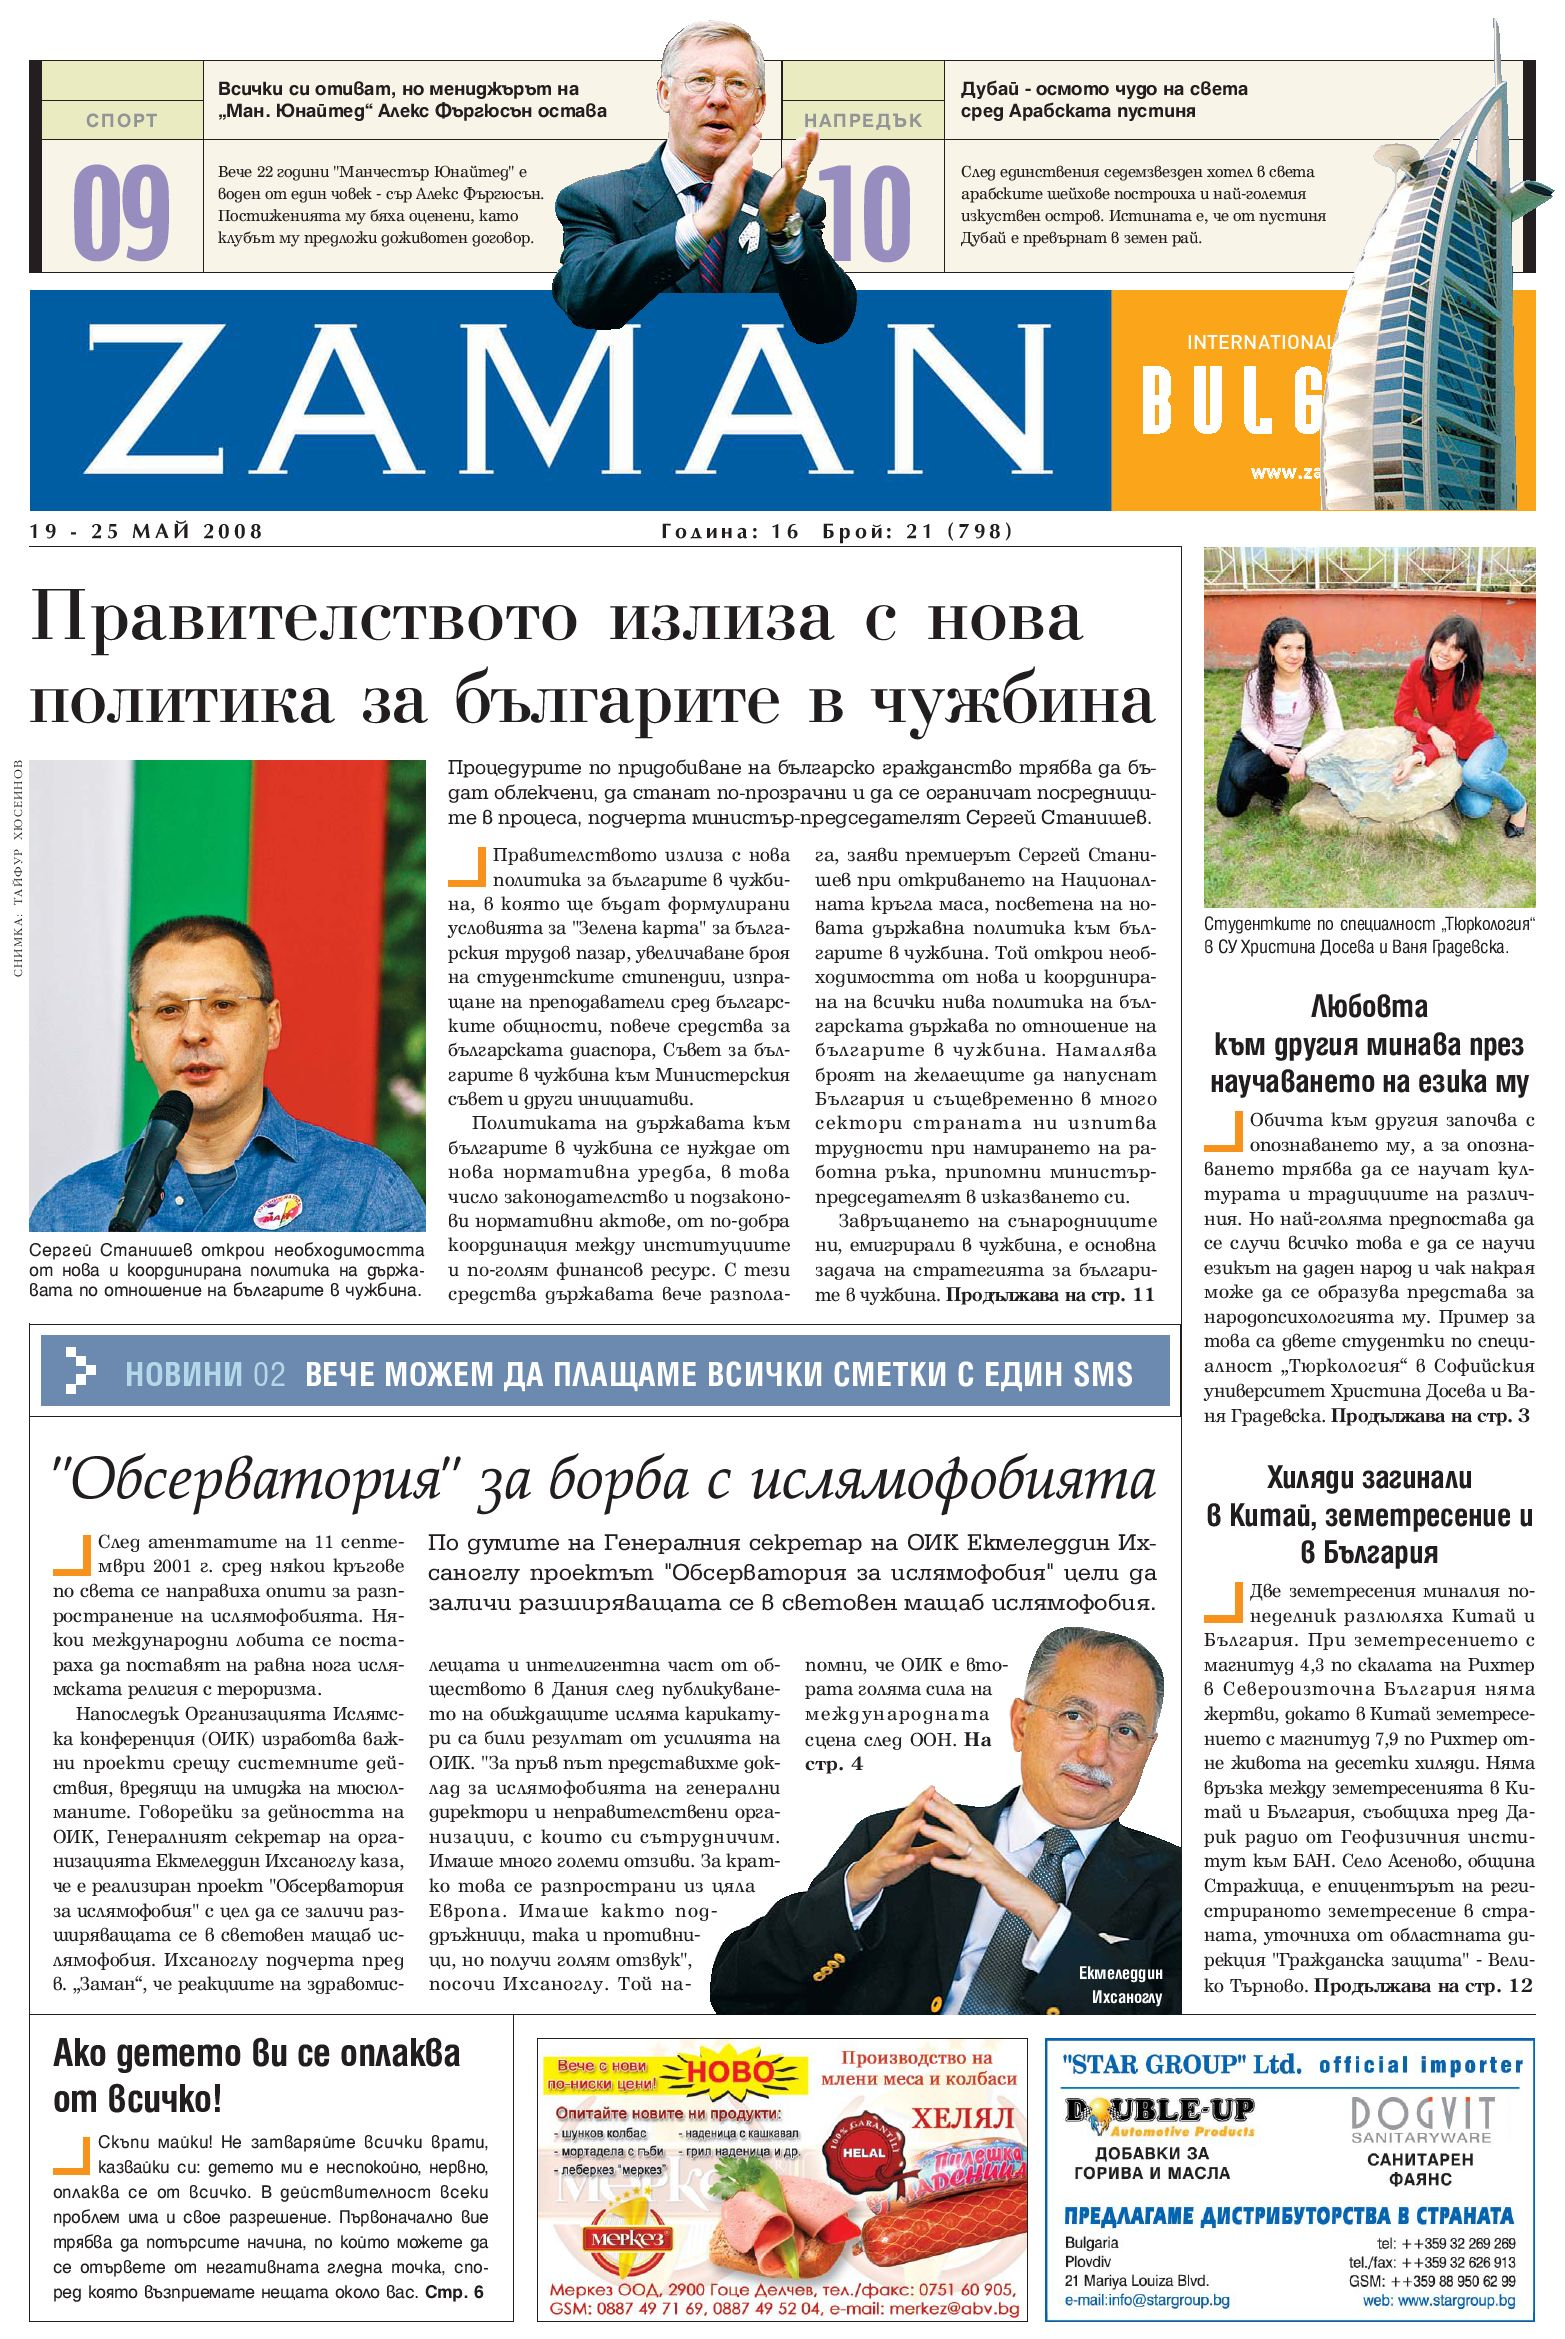 Zaman Bulgaristan 19 Mayis 2008 By Zaman Bulgaristan Issuu